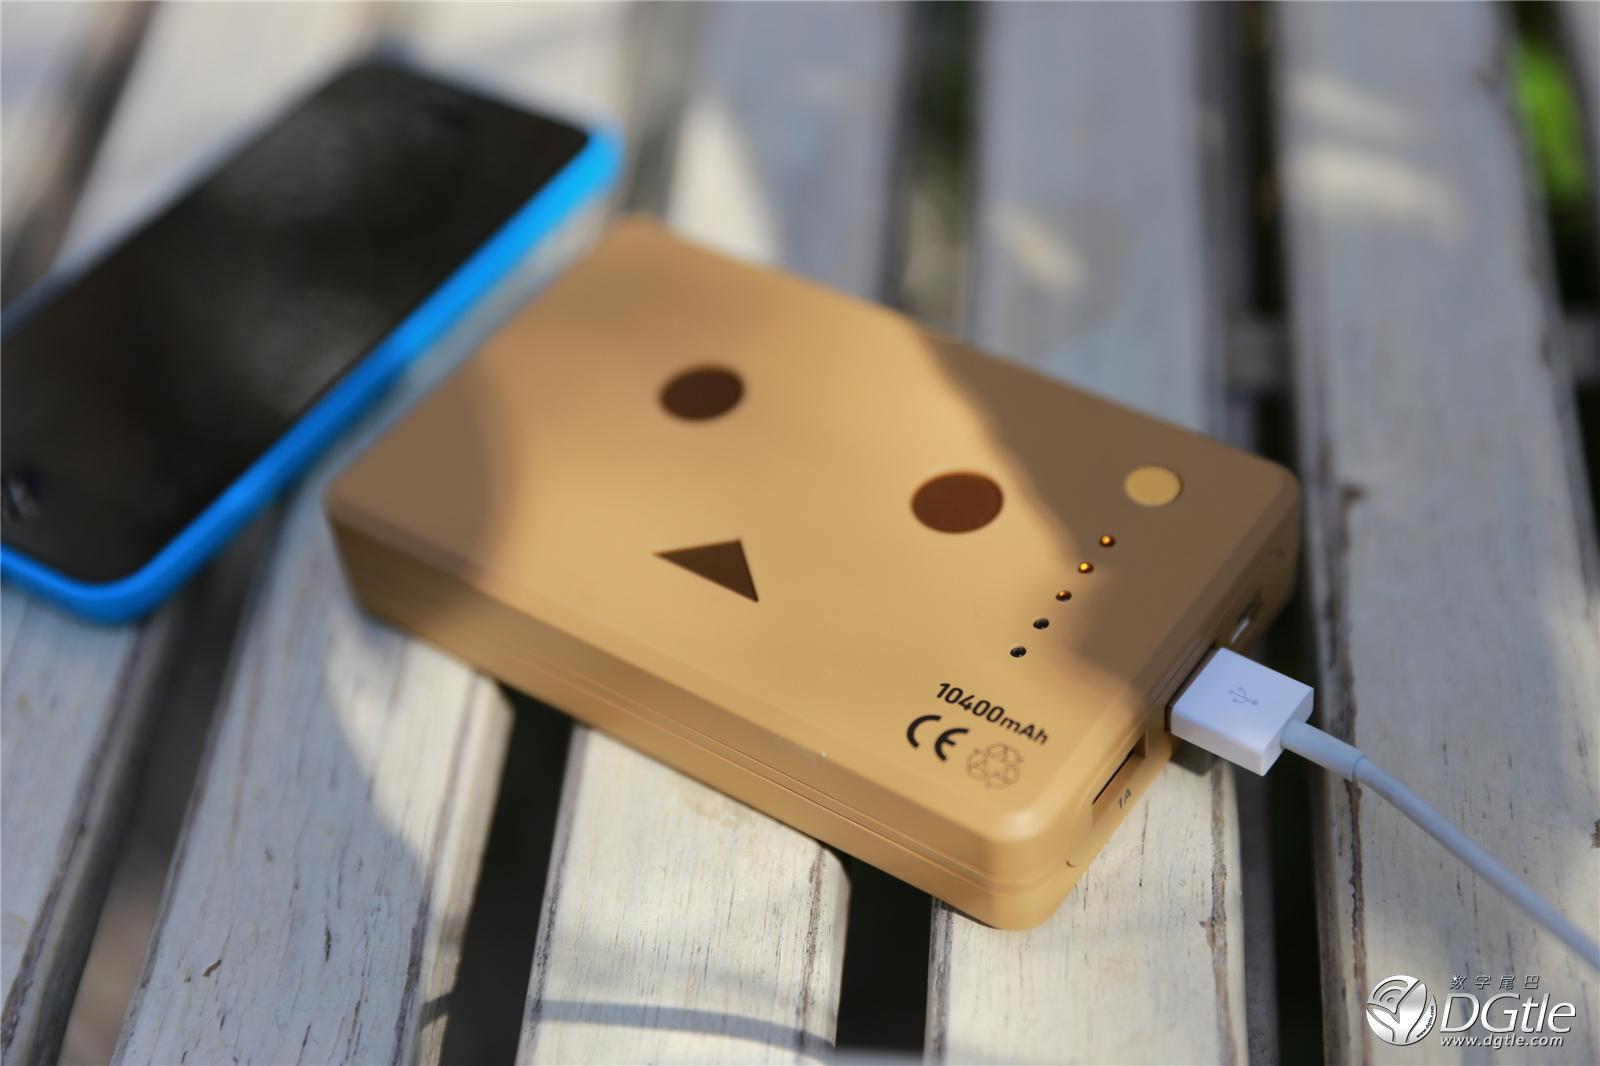 Hot sells Japan Cheero Power Plus Danboard version 10400mAh color Mobile  Brown Carton robot Portable Power bank for iphone ipad